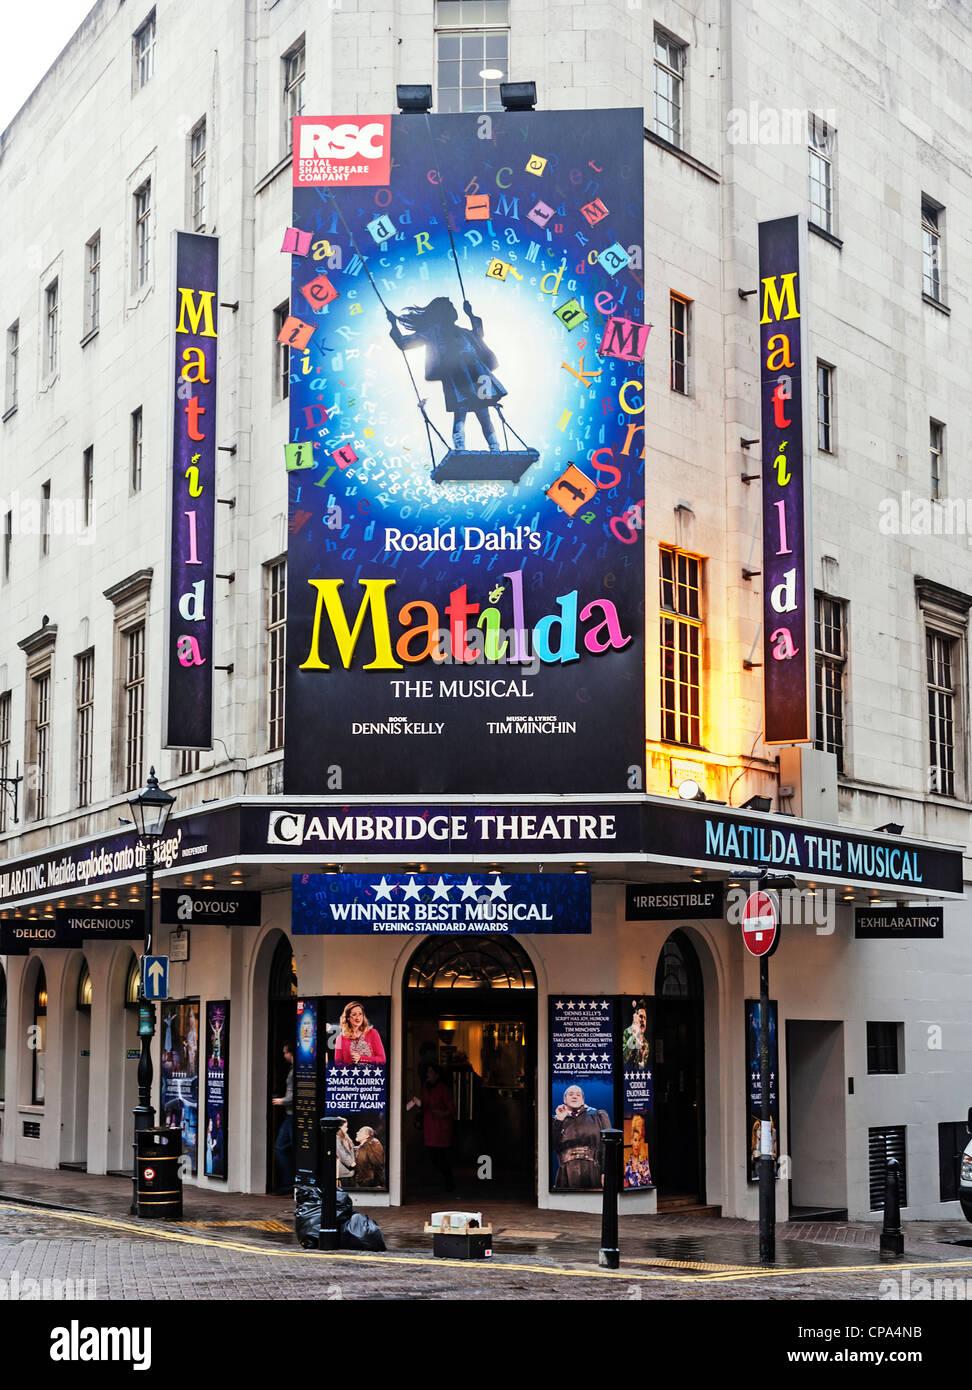 The musical Matilda at the Cambridge Theatre, Earlham Street, London. England. - Stock Image